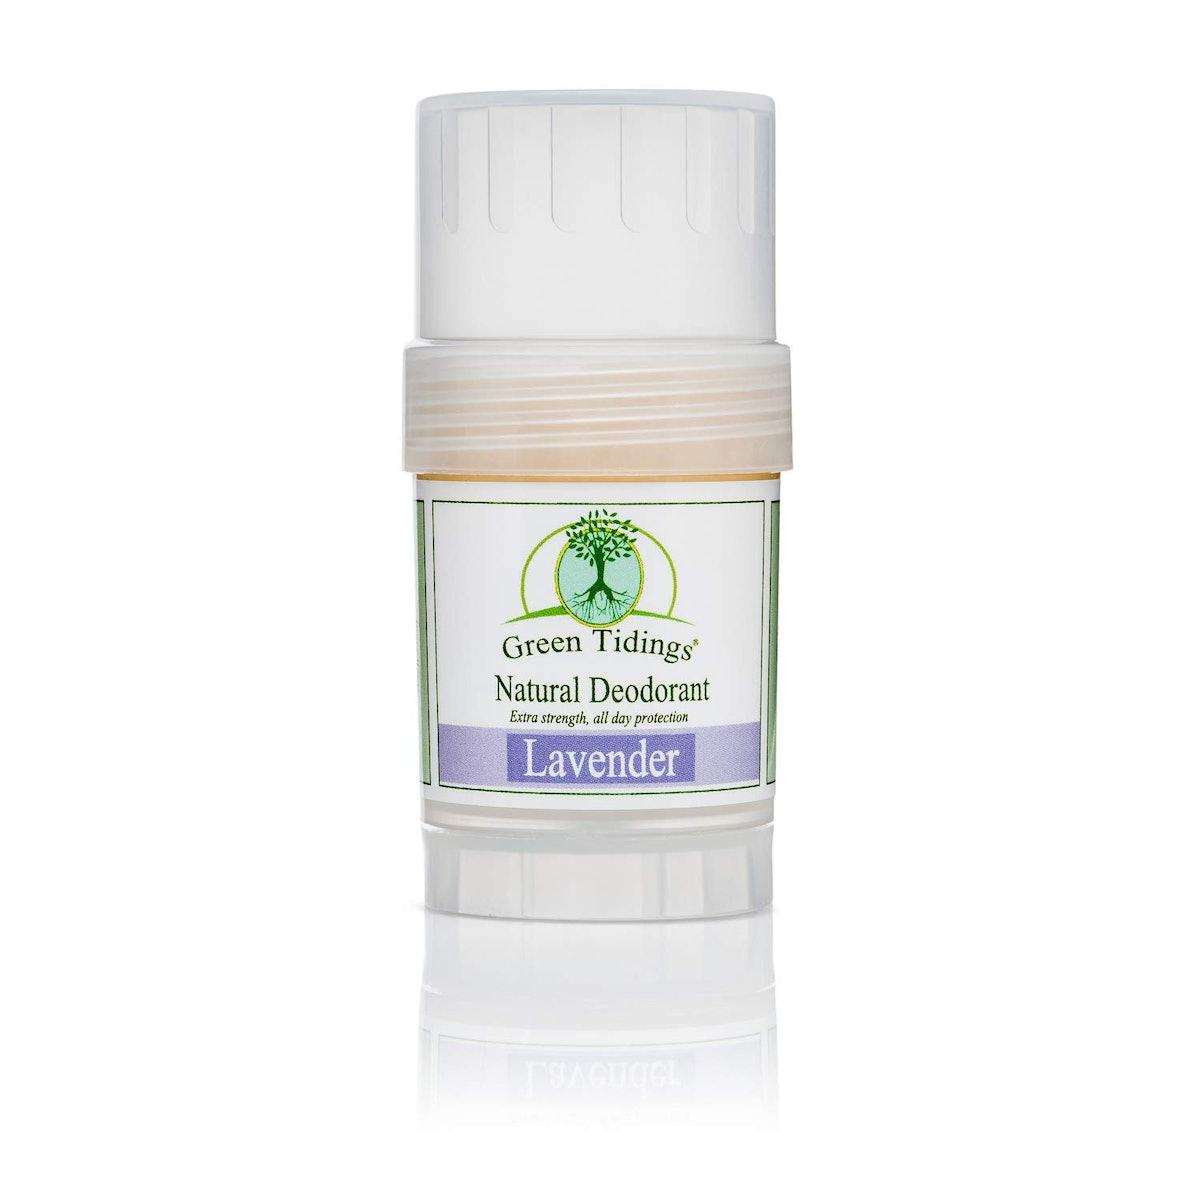 Green Tidings Natural Deodorant